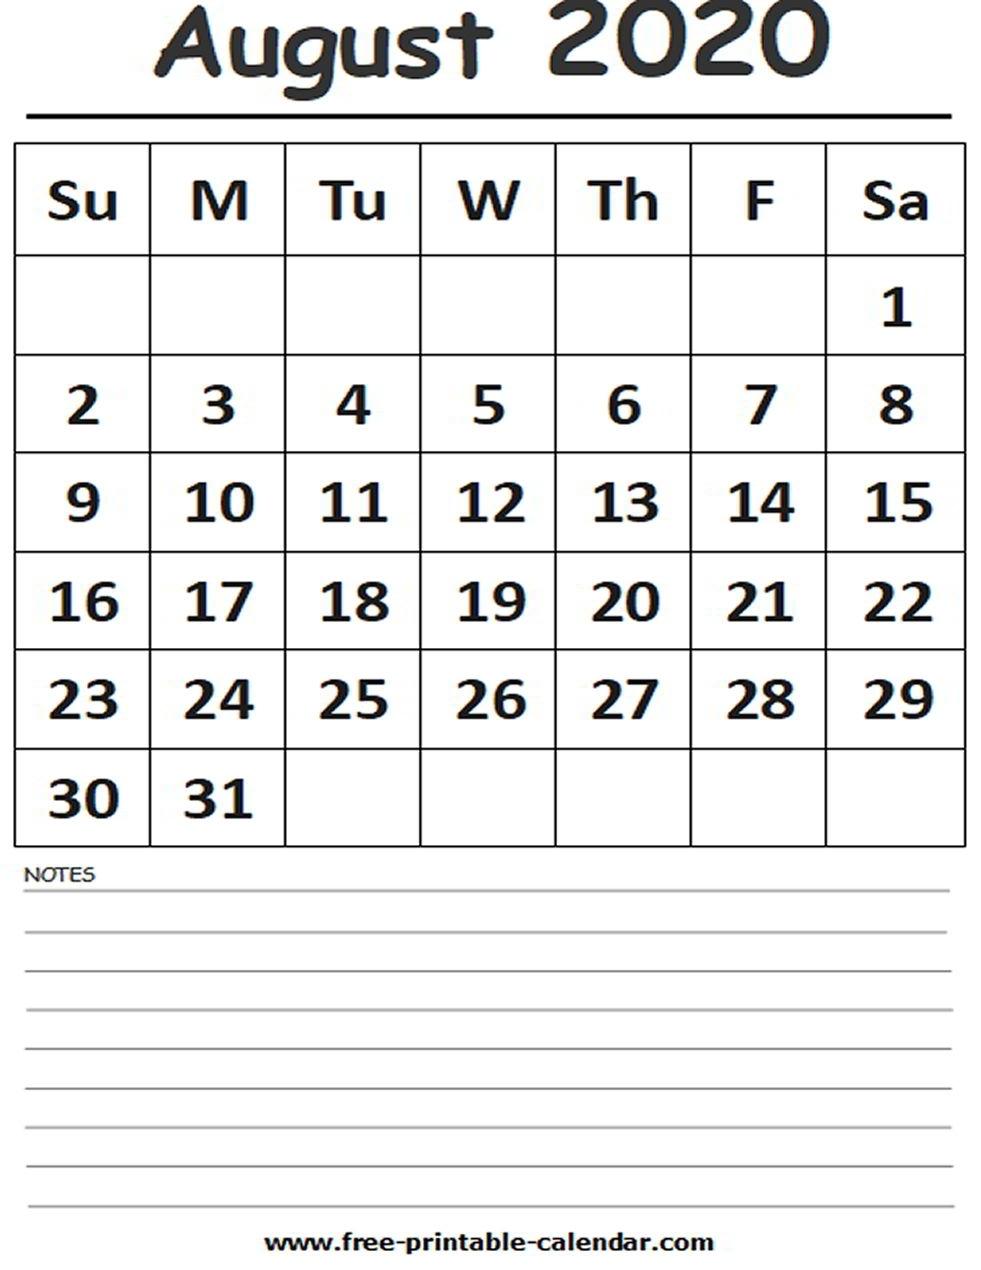 2020 Calendar August Printable - Free-Printable-Calendar